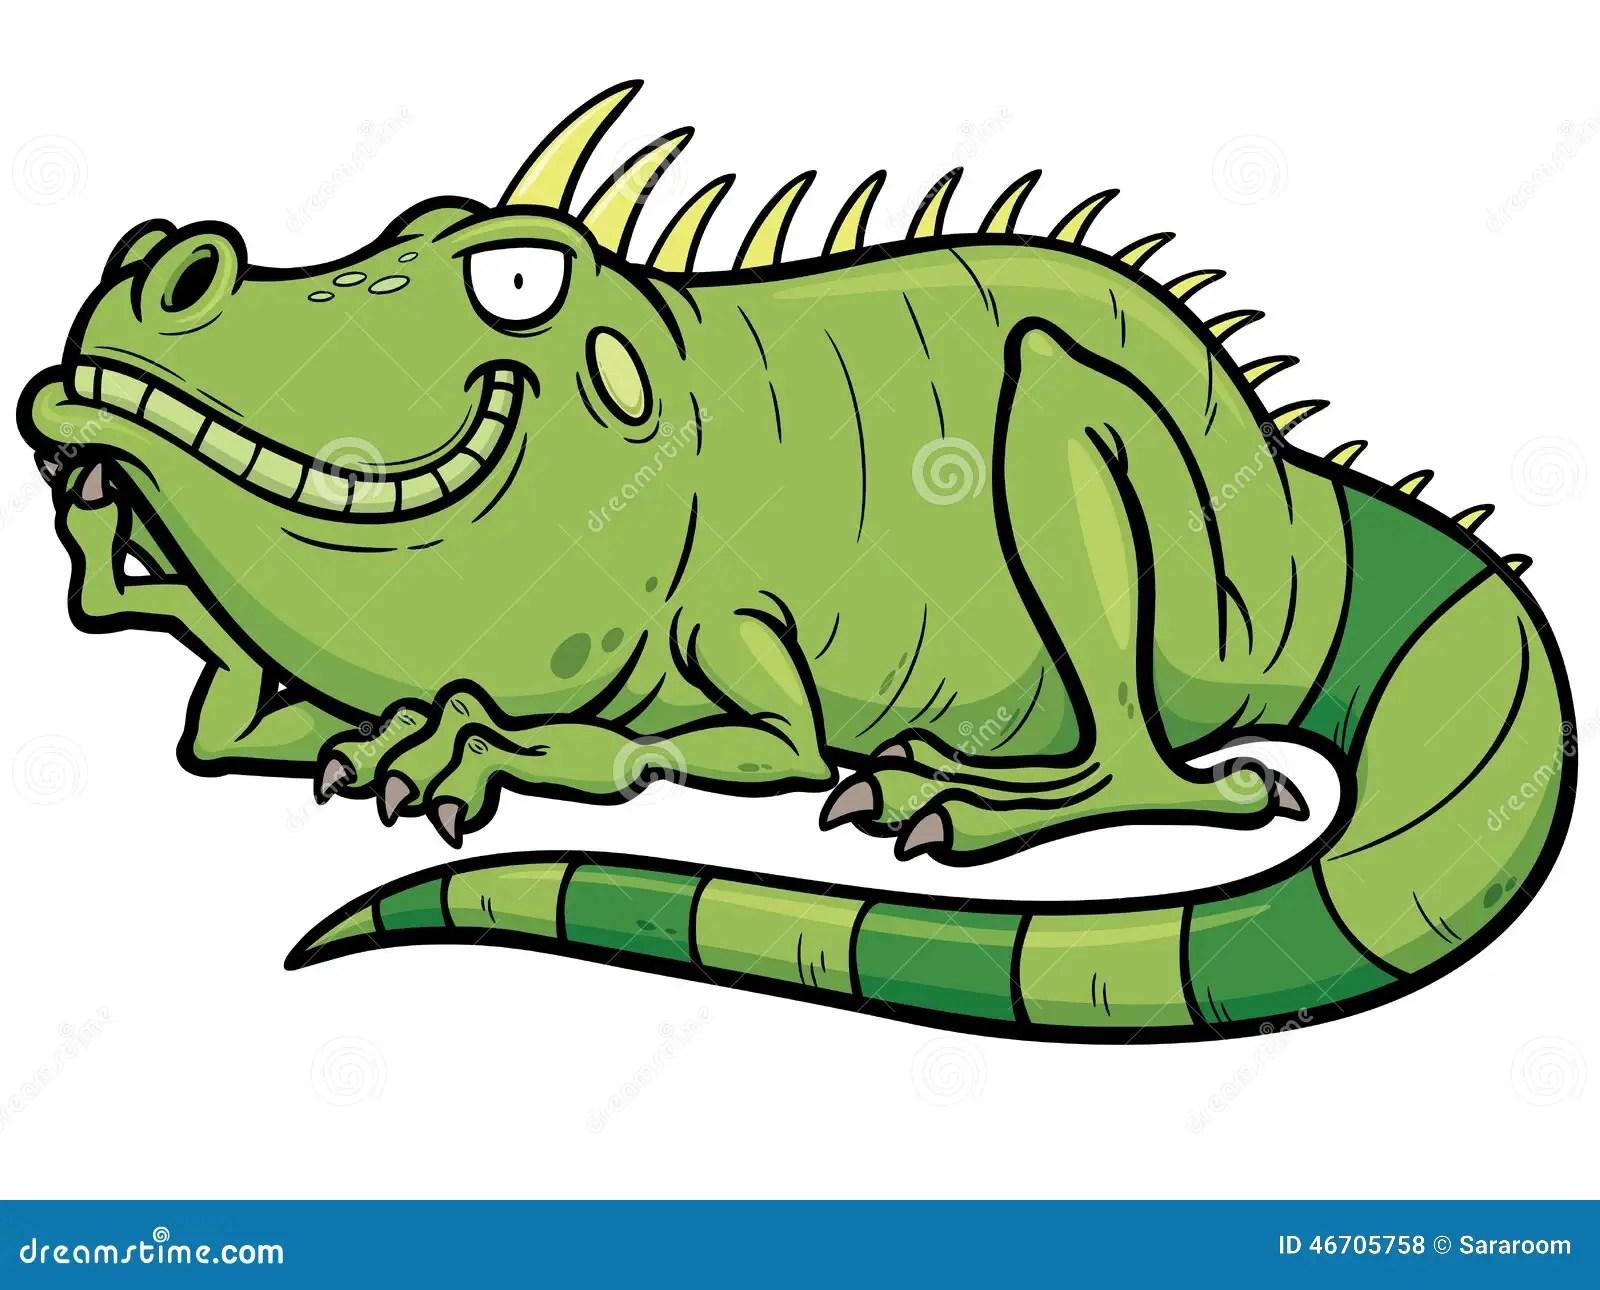 Iguana Cartoons Illustrations Amp Vector Stock Images